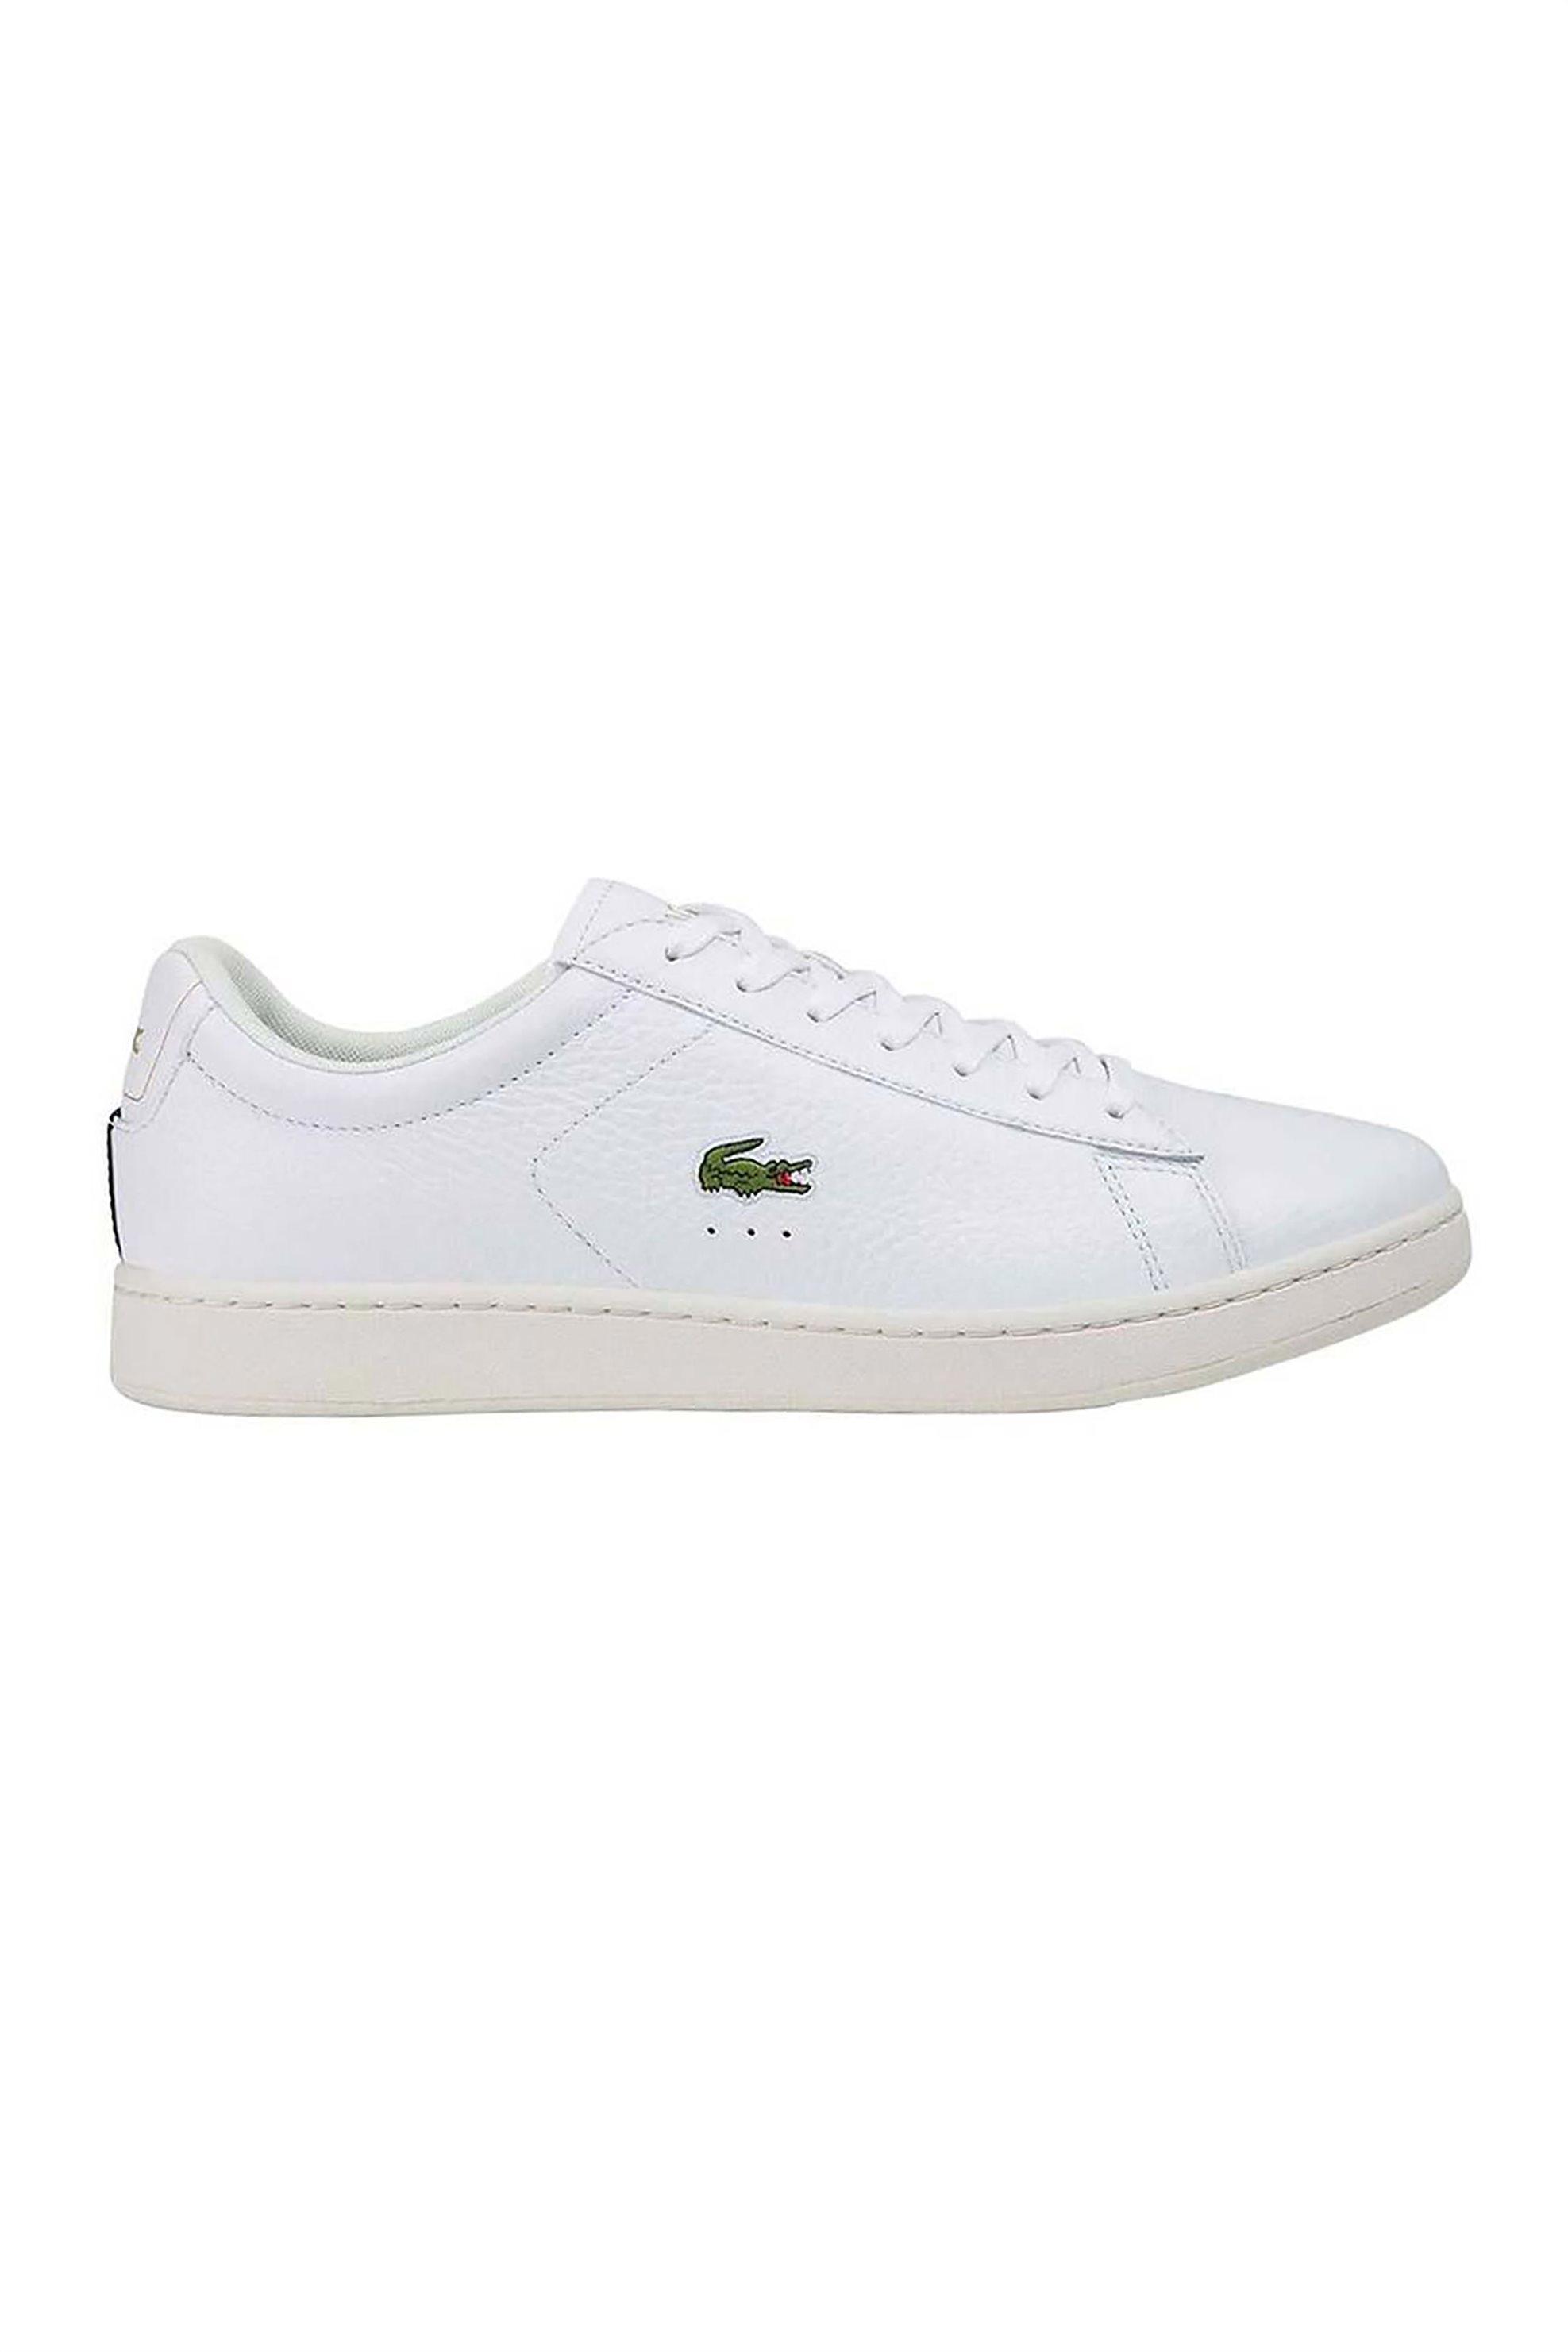 "Lacoste ανδρικα sneakers με κορδόνια ""Carnaby Evo 0120 2"" – 40SMA0015147 – Λευκό"